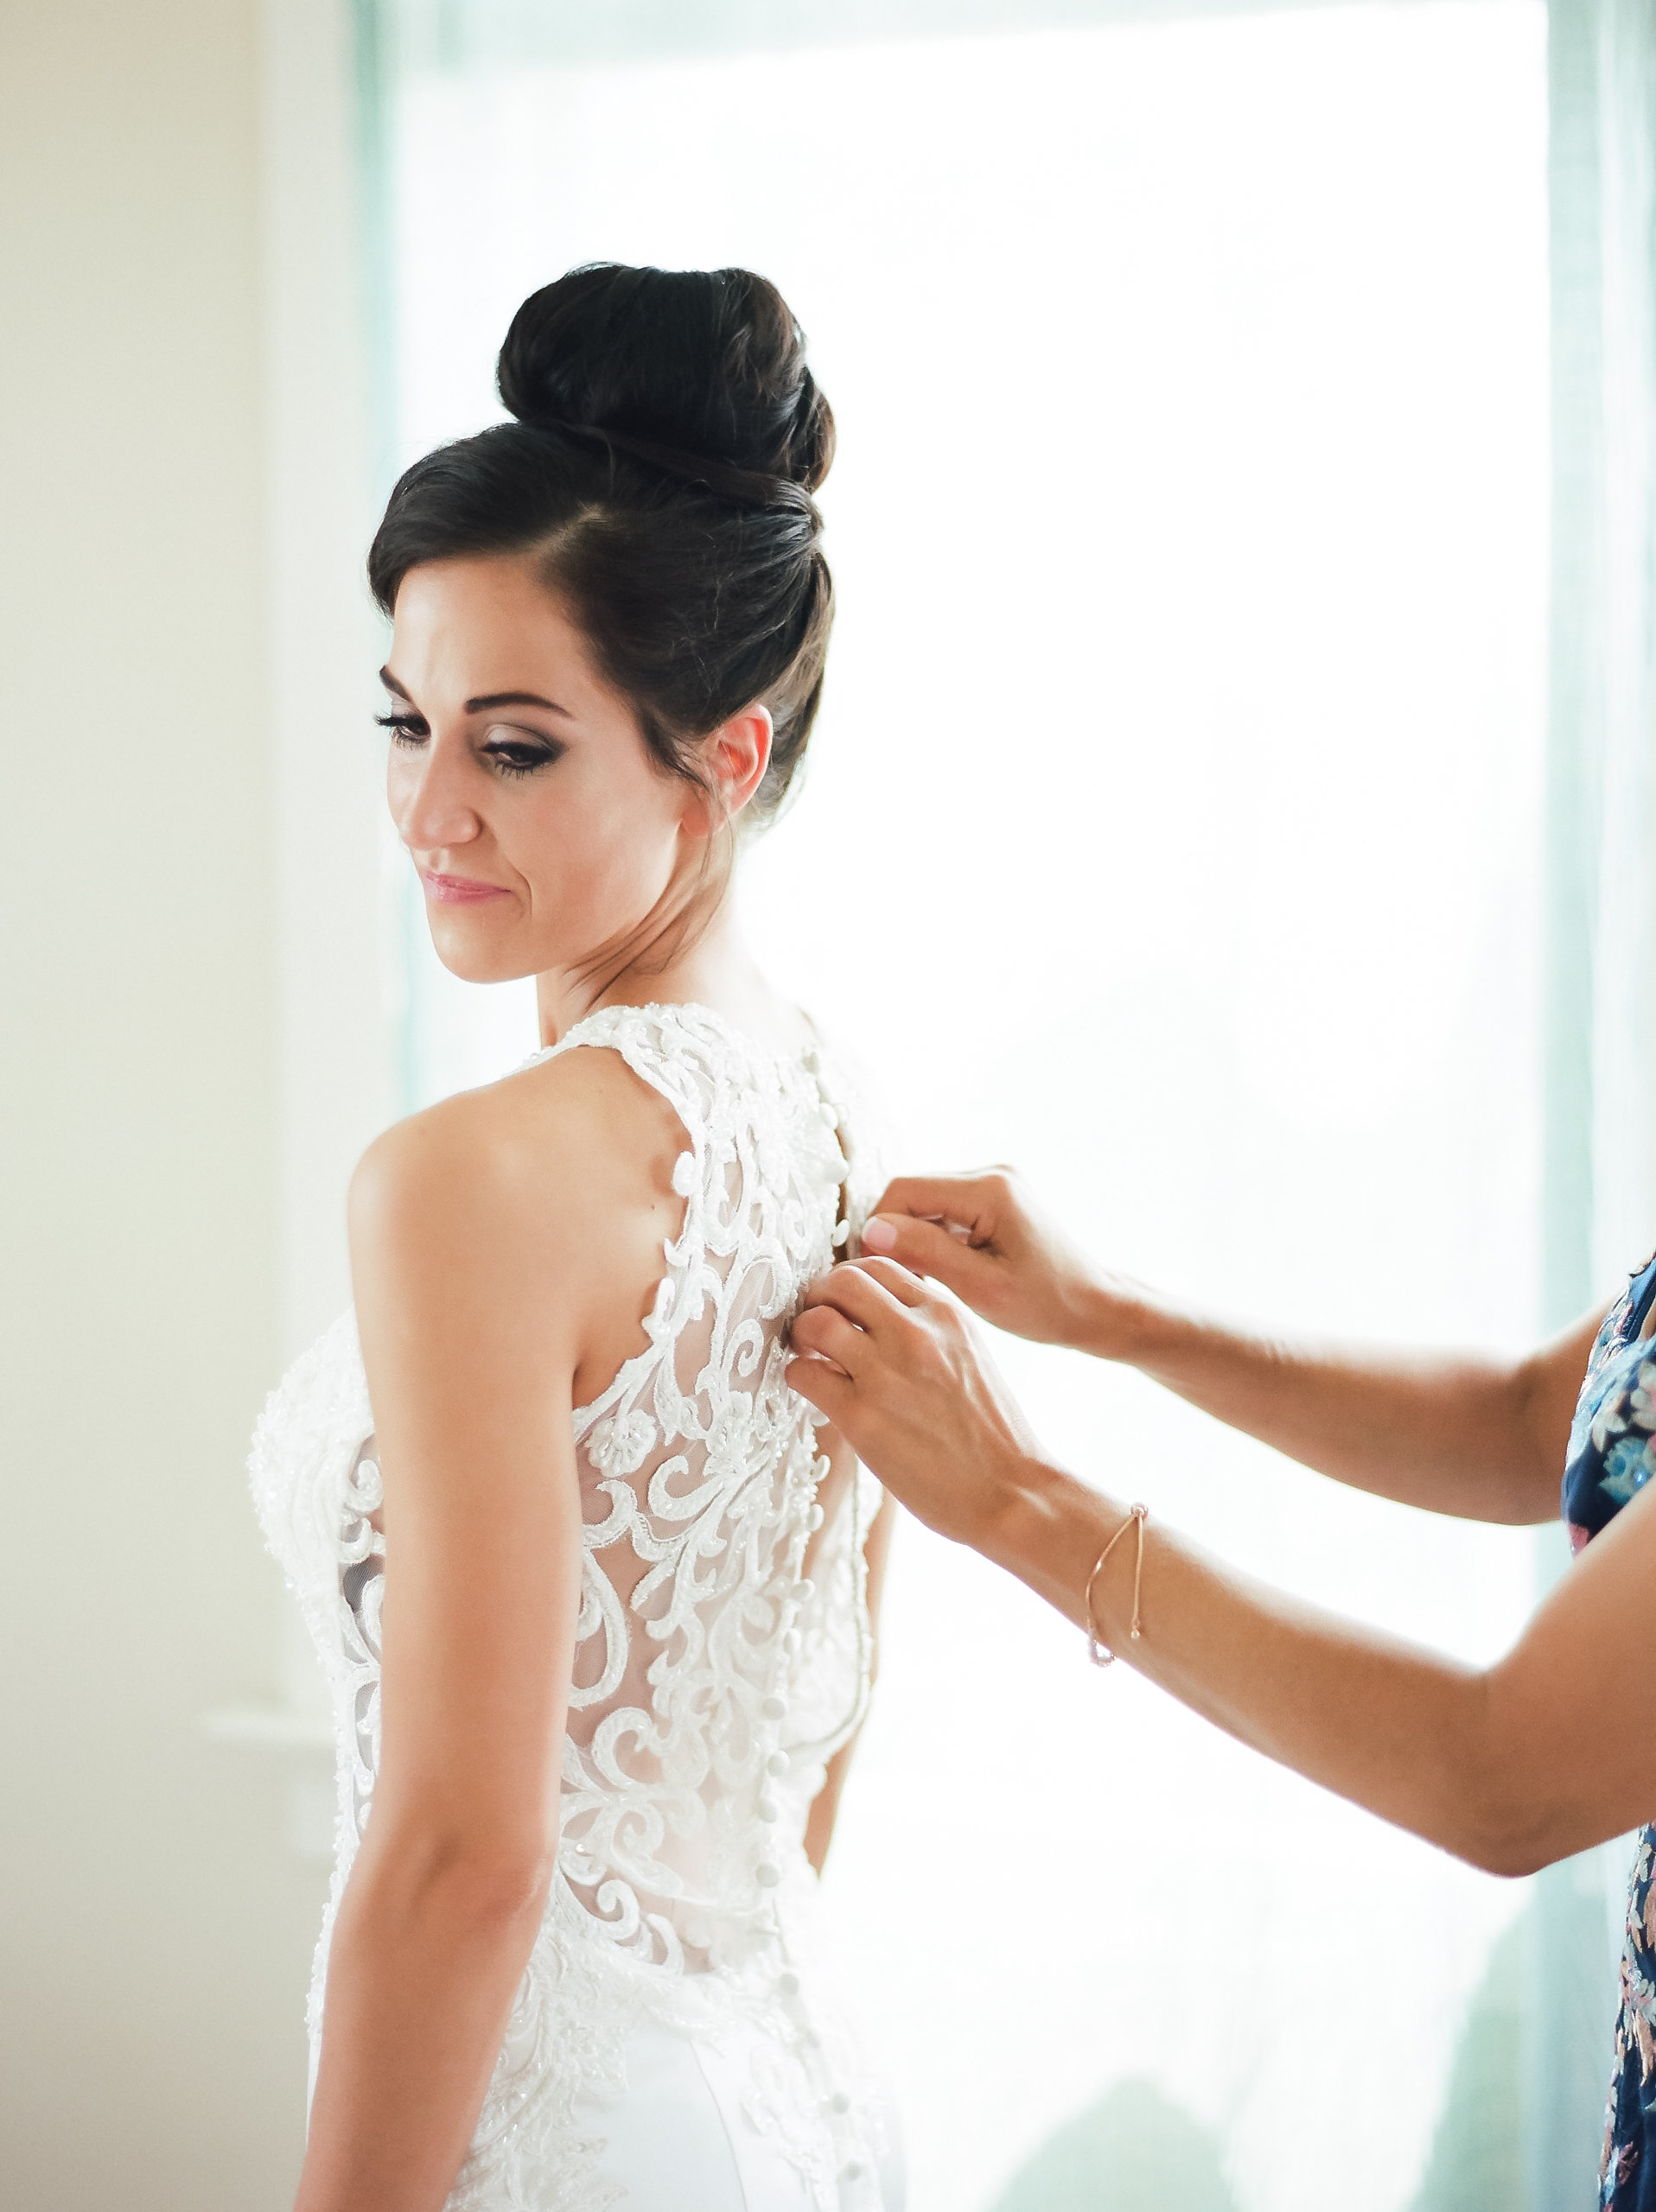 MagdalenaStudios_WeddingPhotographer_WillowCreekWinery_CarissaJoe-201.jpg